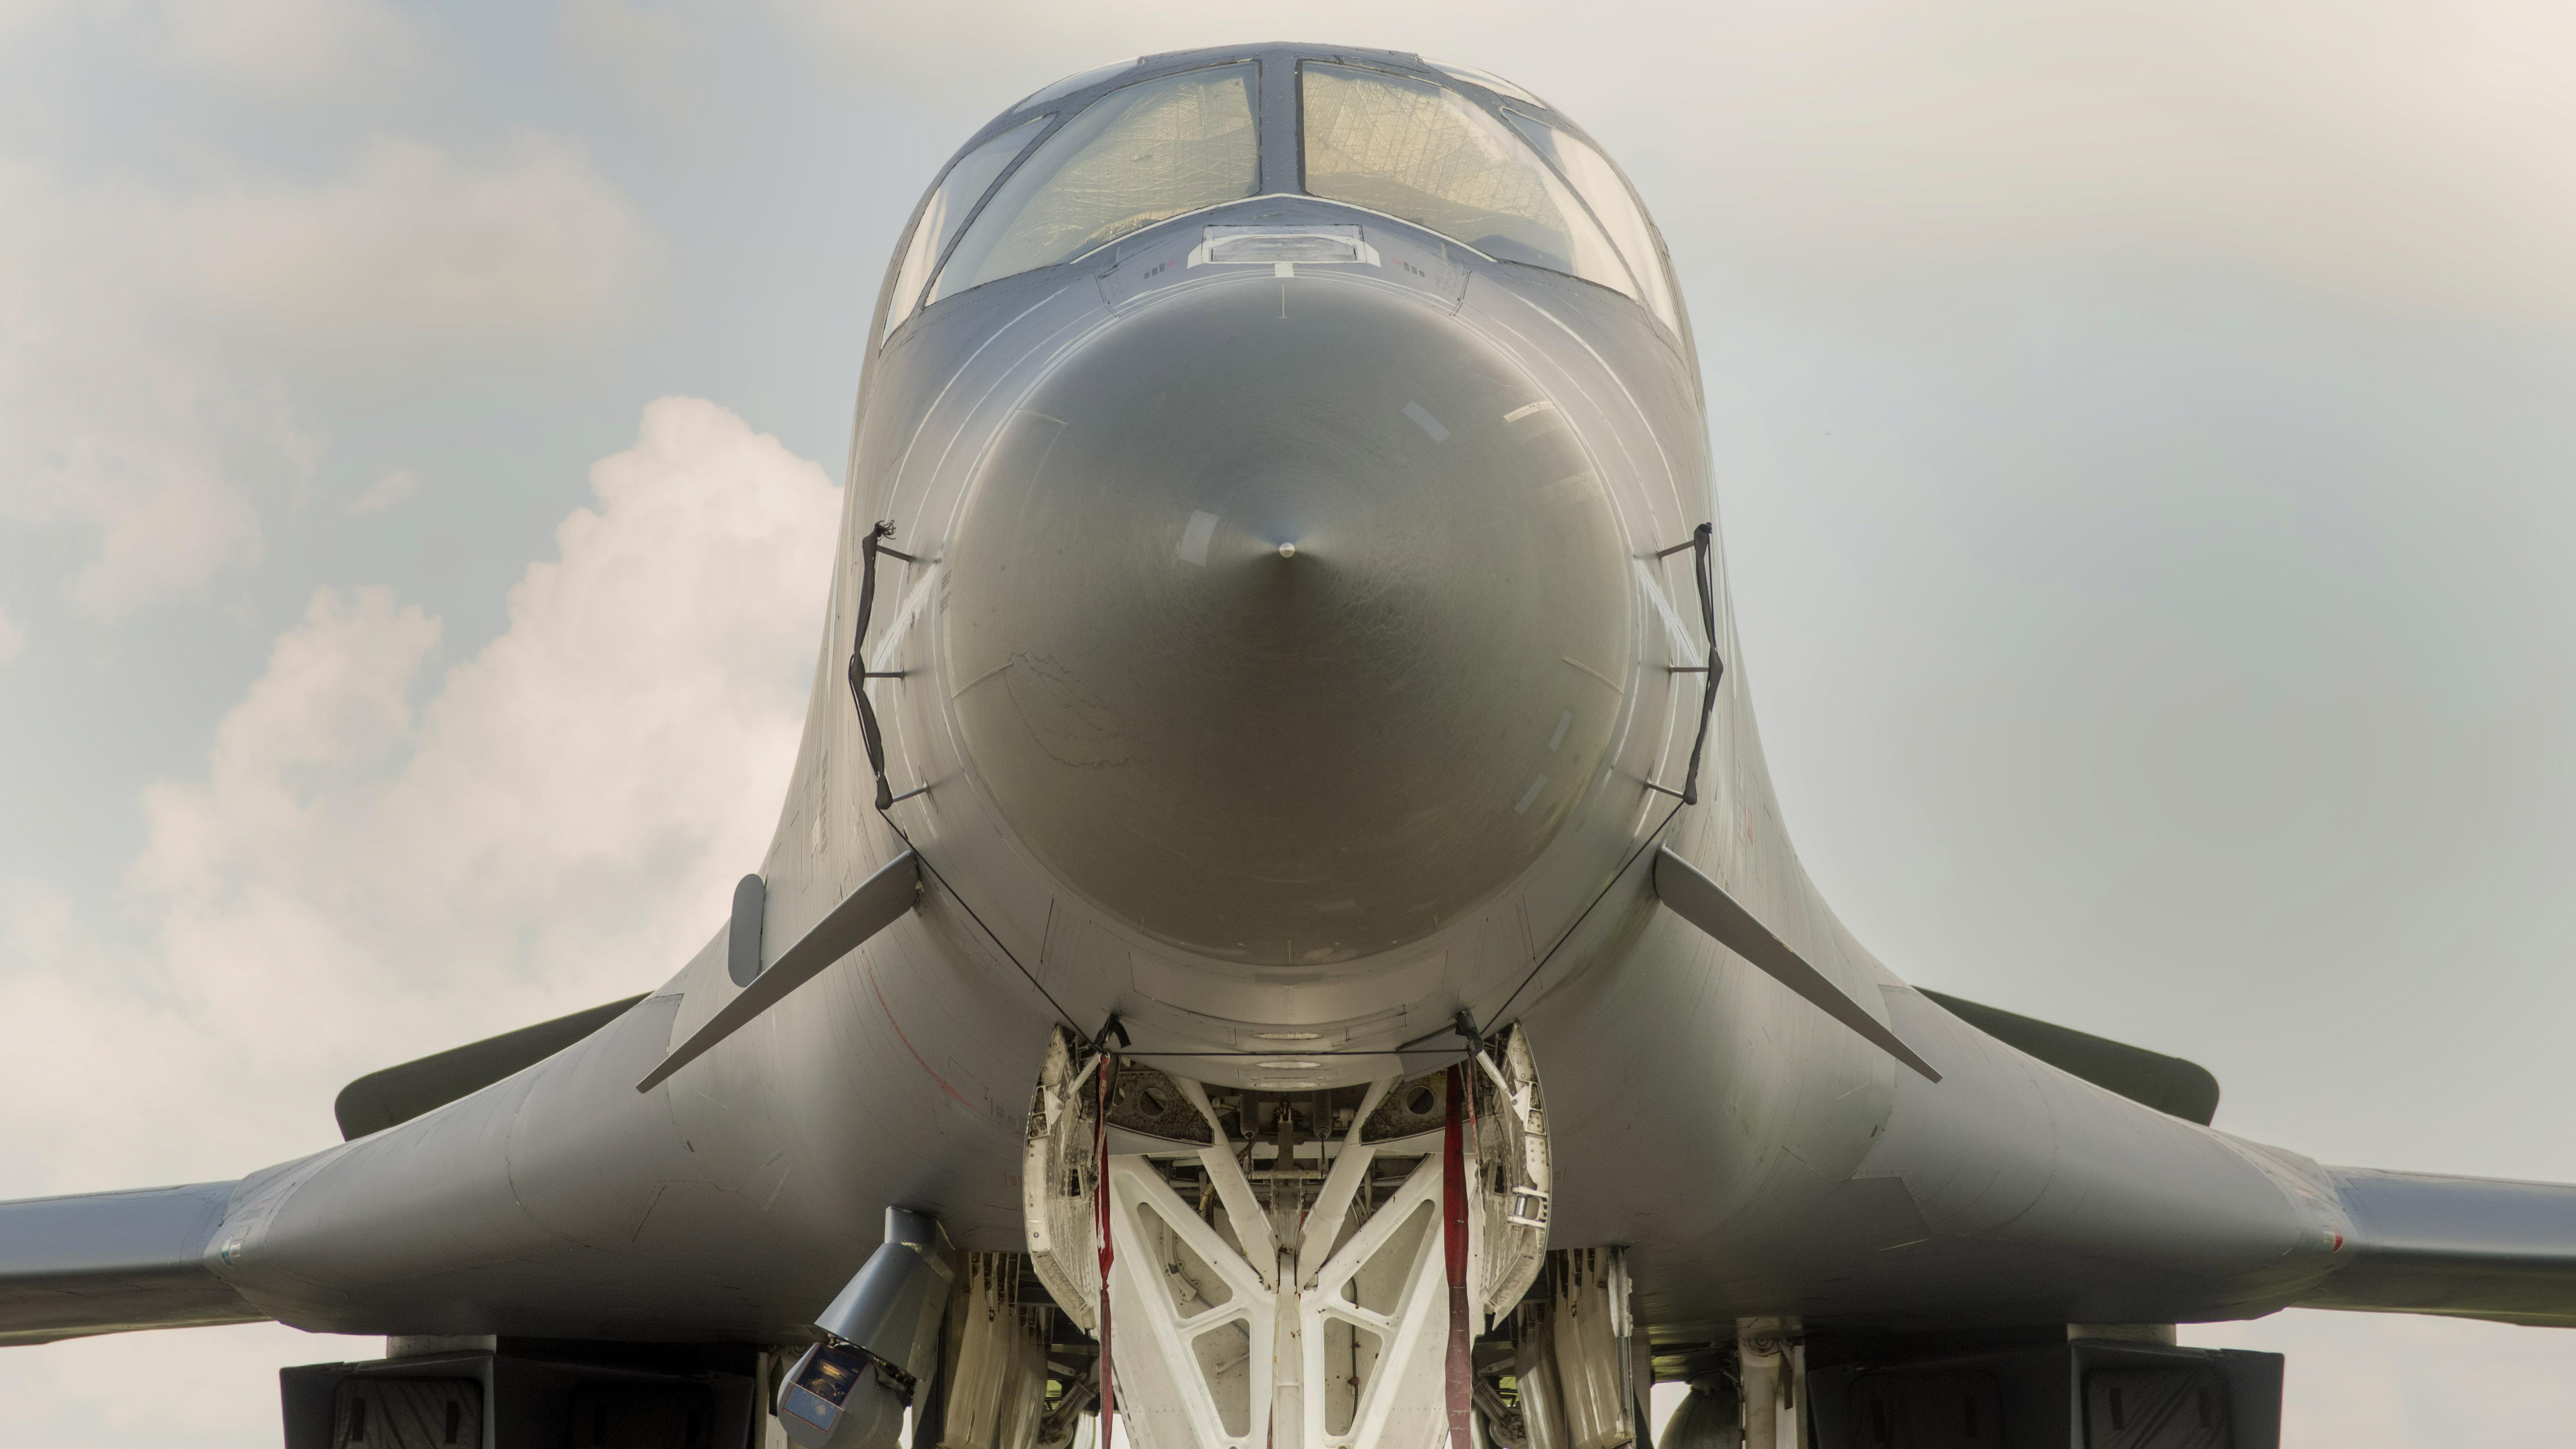 _IMG2257 Rockwell B-1B Lancer USAF 86-0111